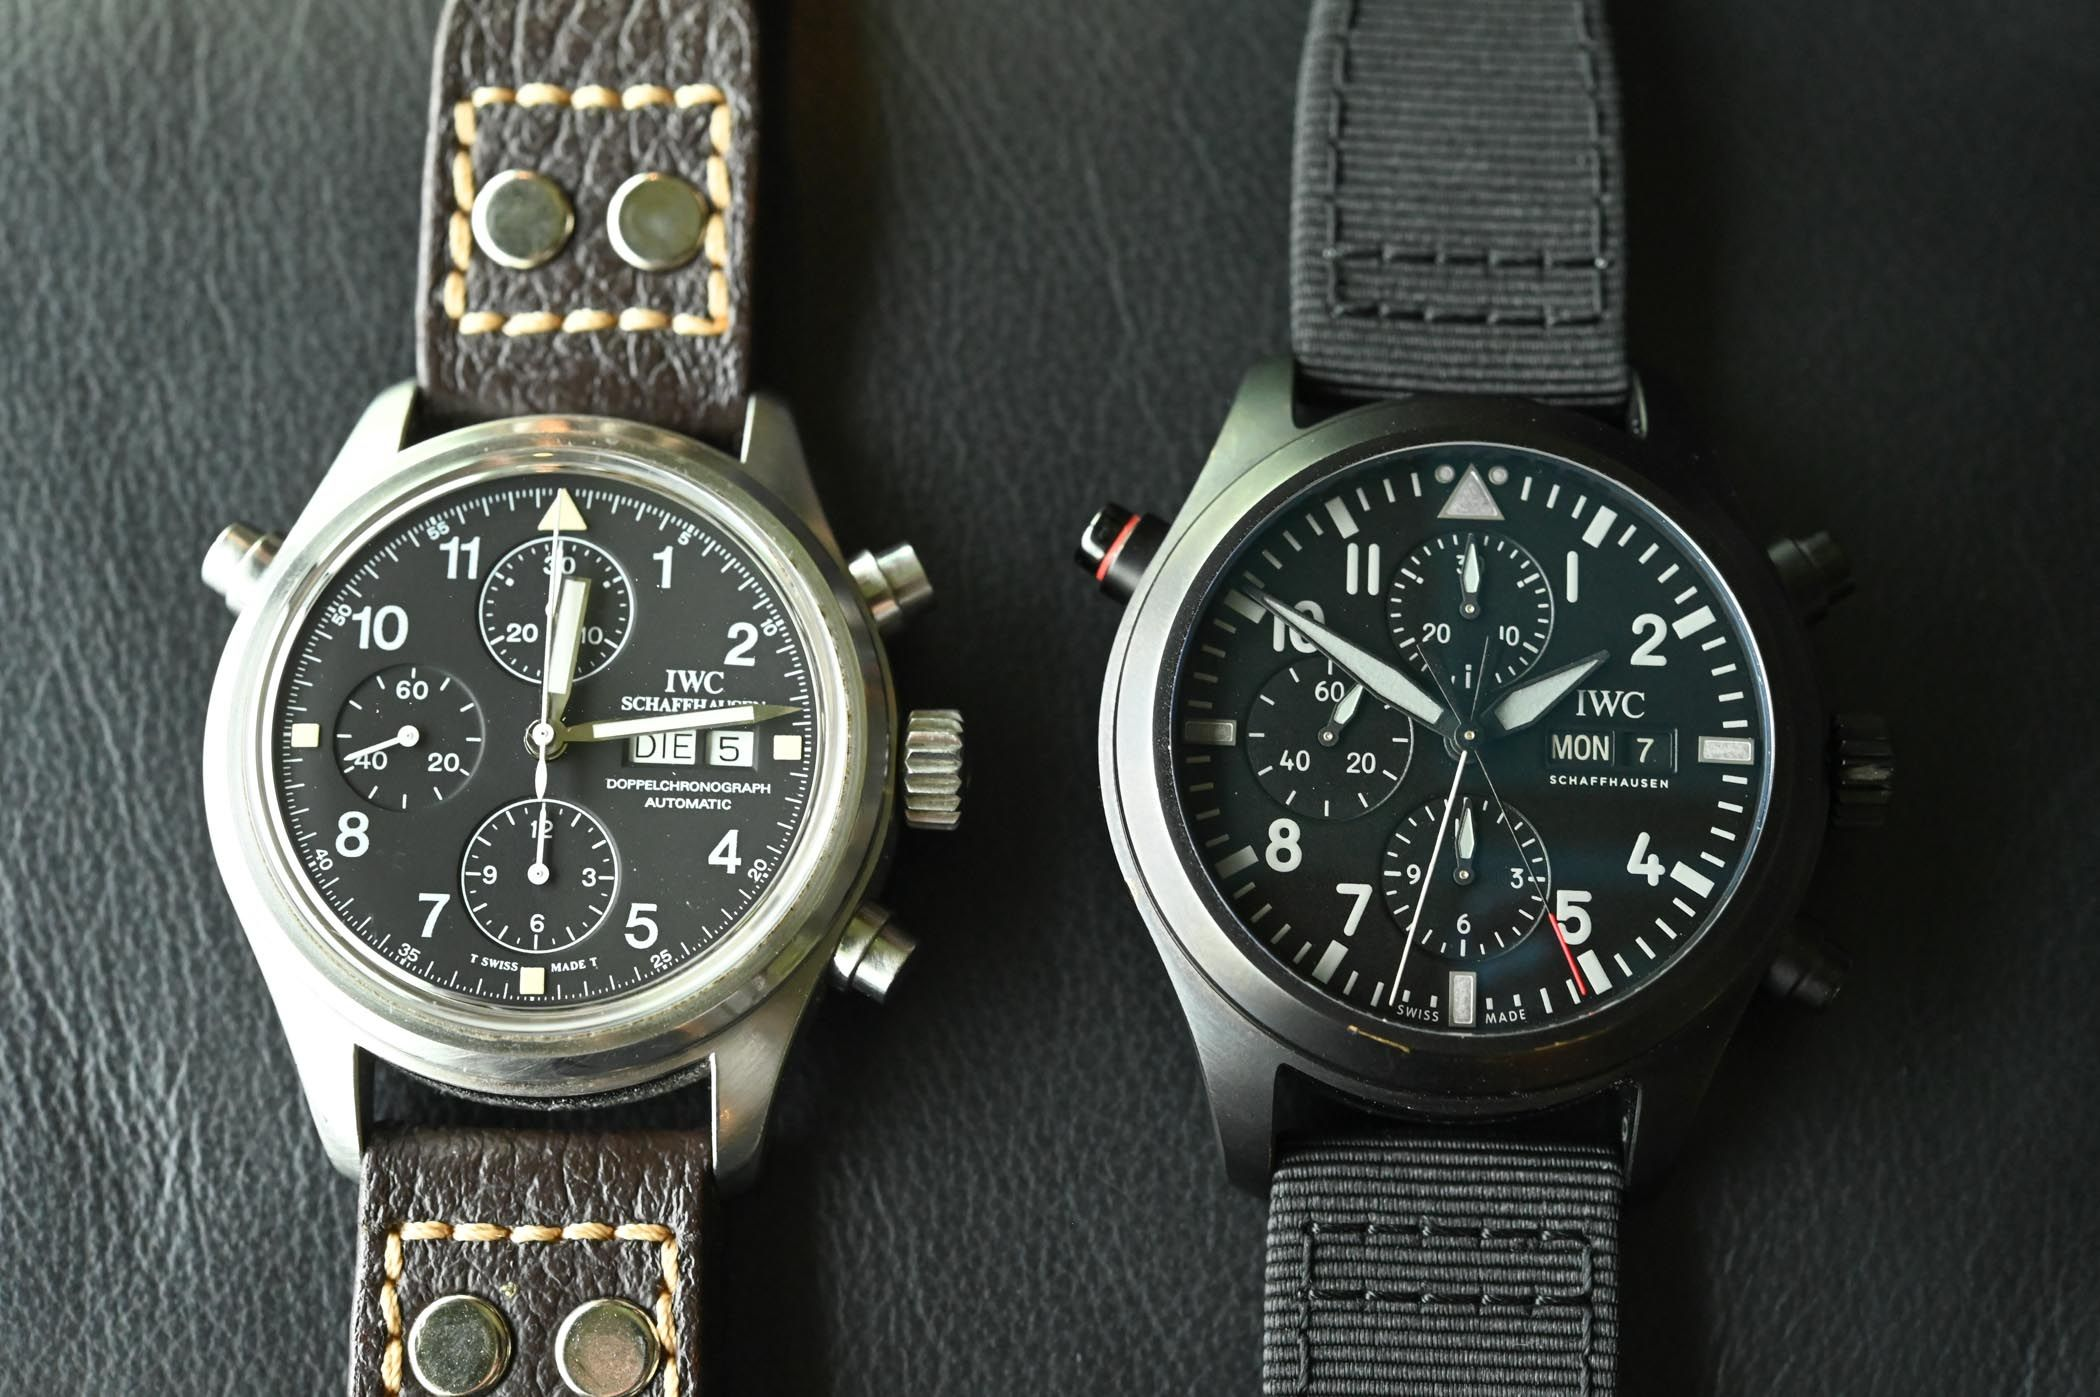 a69564101 Pre-SIHH 2019 - IWC Pilot's Watch Double Chronograph TOP GUN Ceratanium  (Specs & Price)